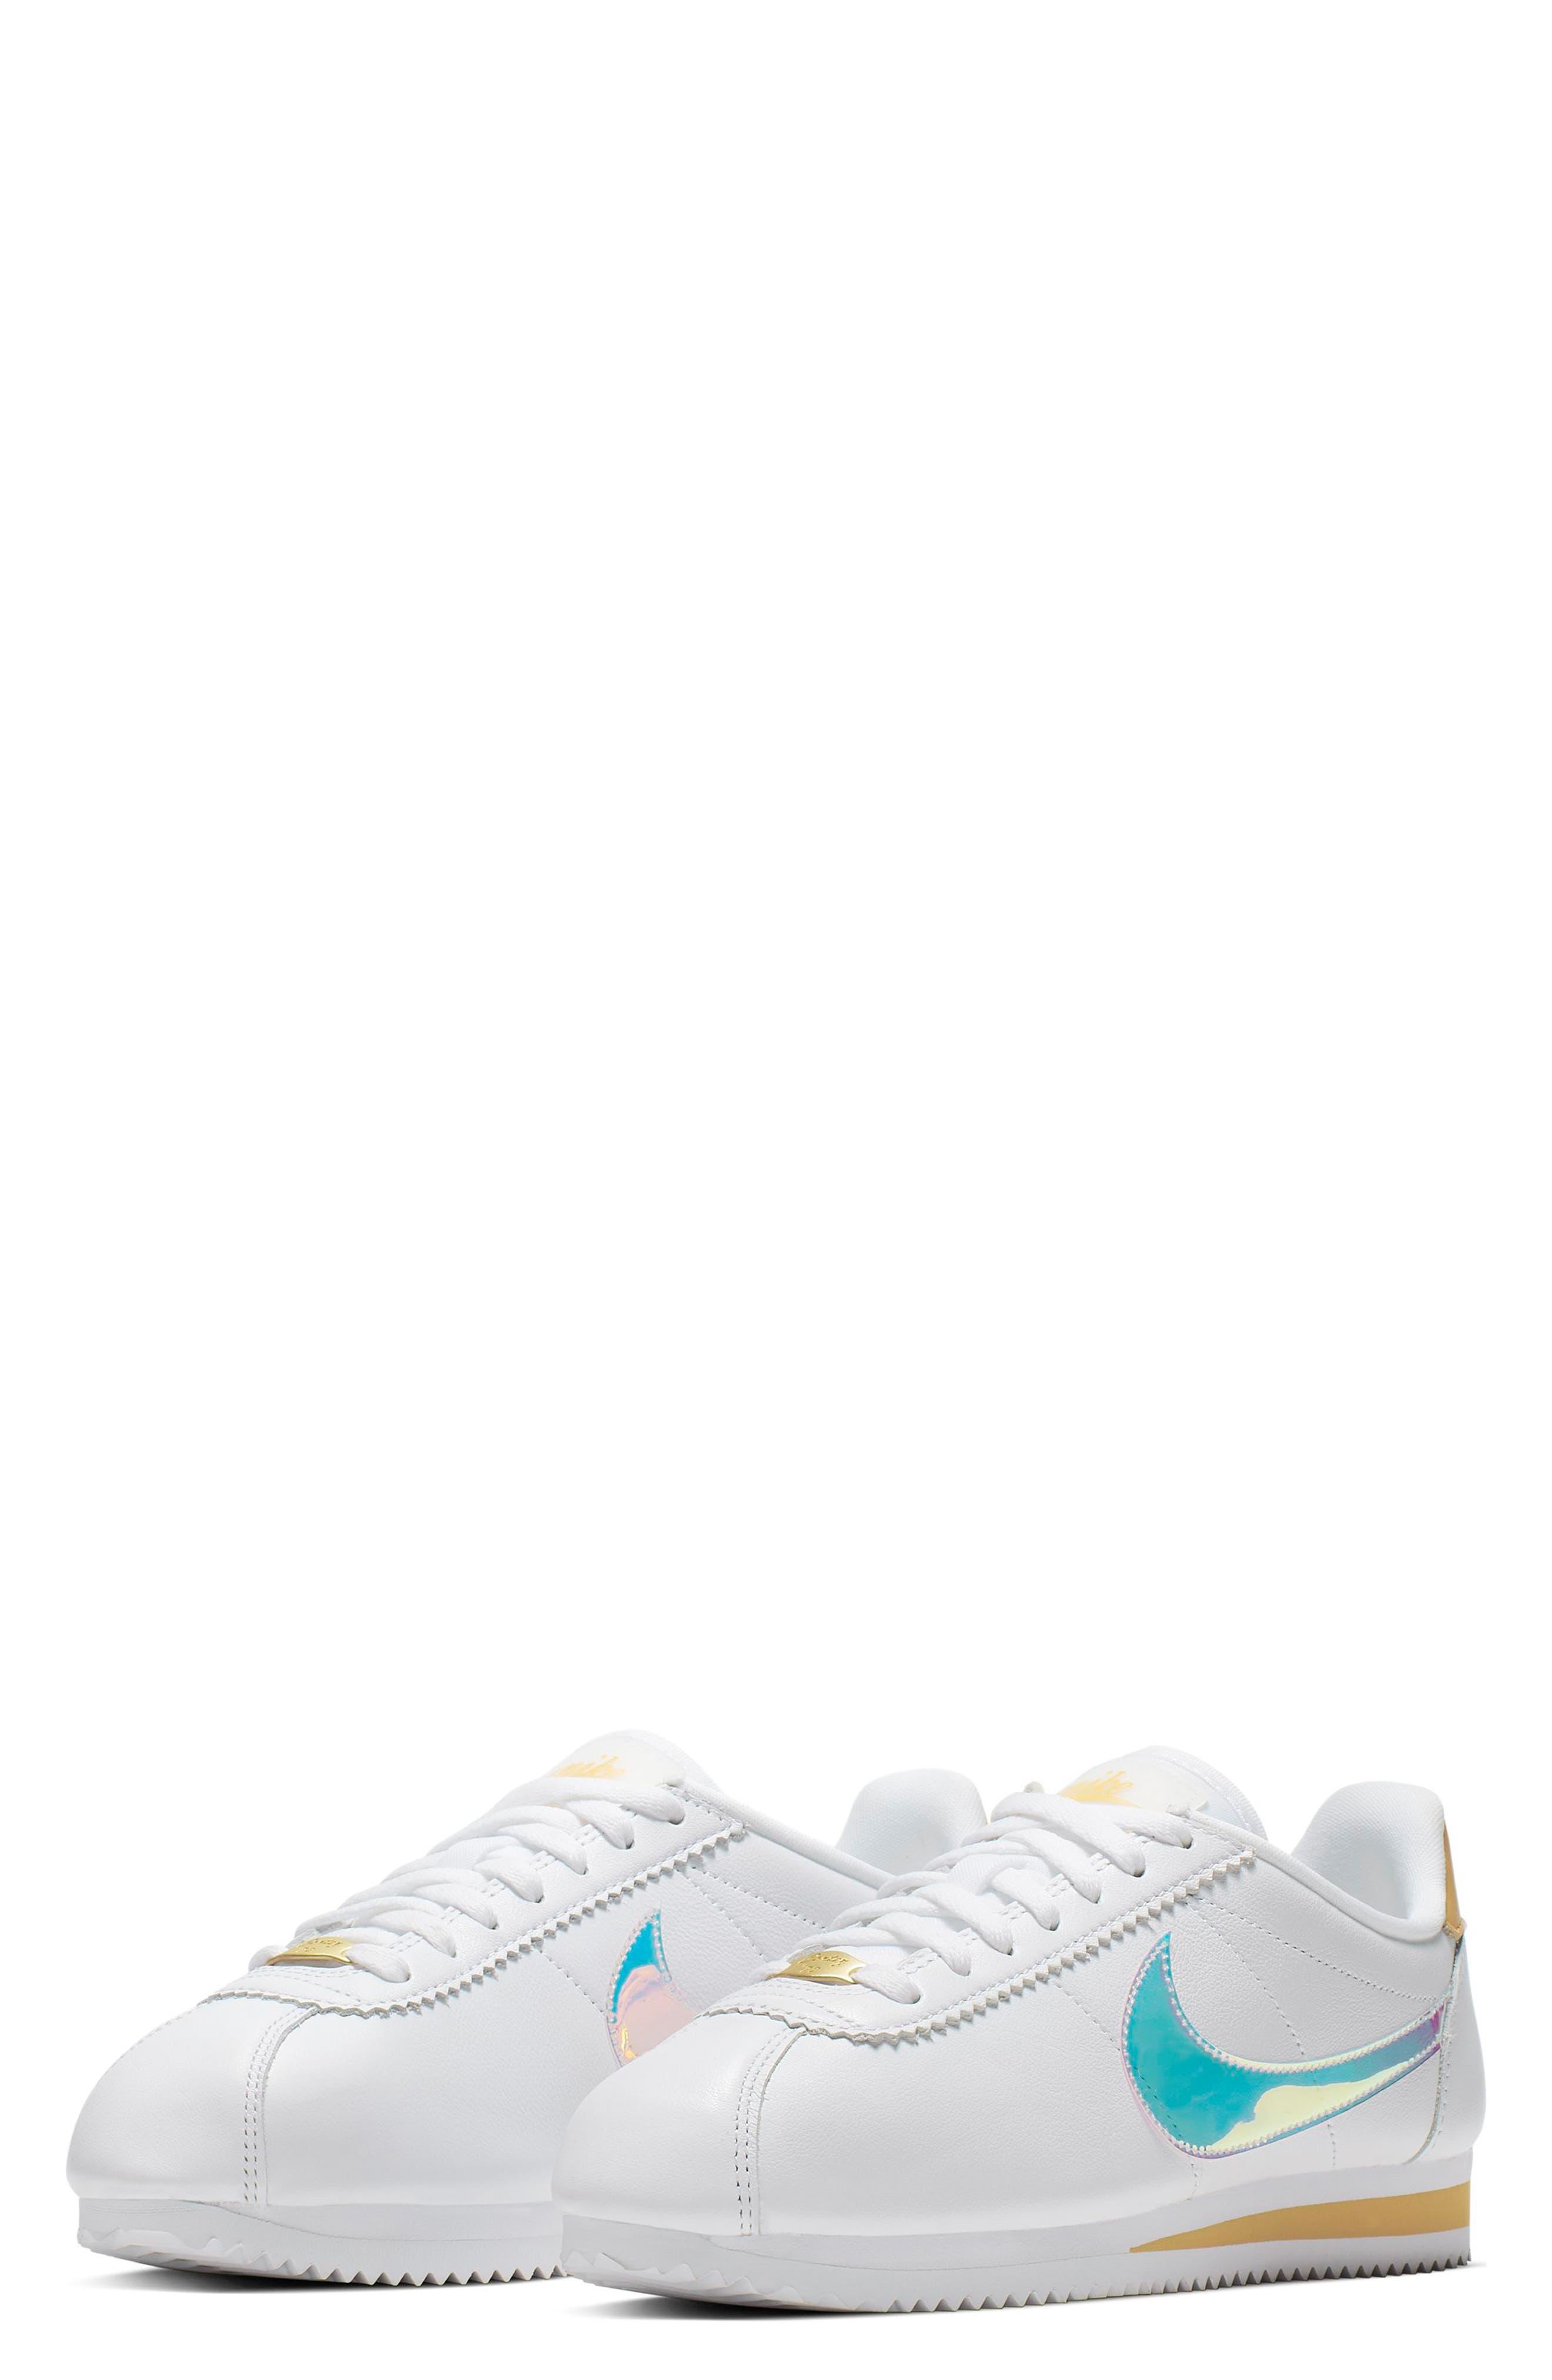 2fe736d4 ... for nike classic cortez sneaker women 5fd38 6f245 coupon for nike  classic cortez sneaker women 5fd38 6f245; coupon nike air flight 89 london  306252 400 ...